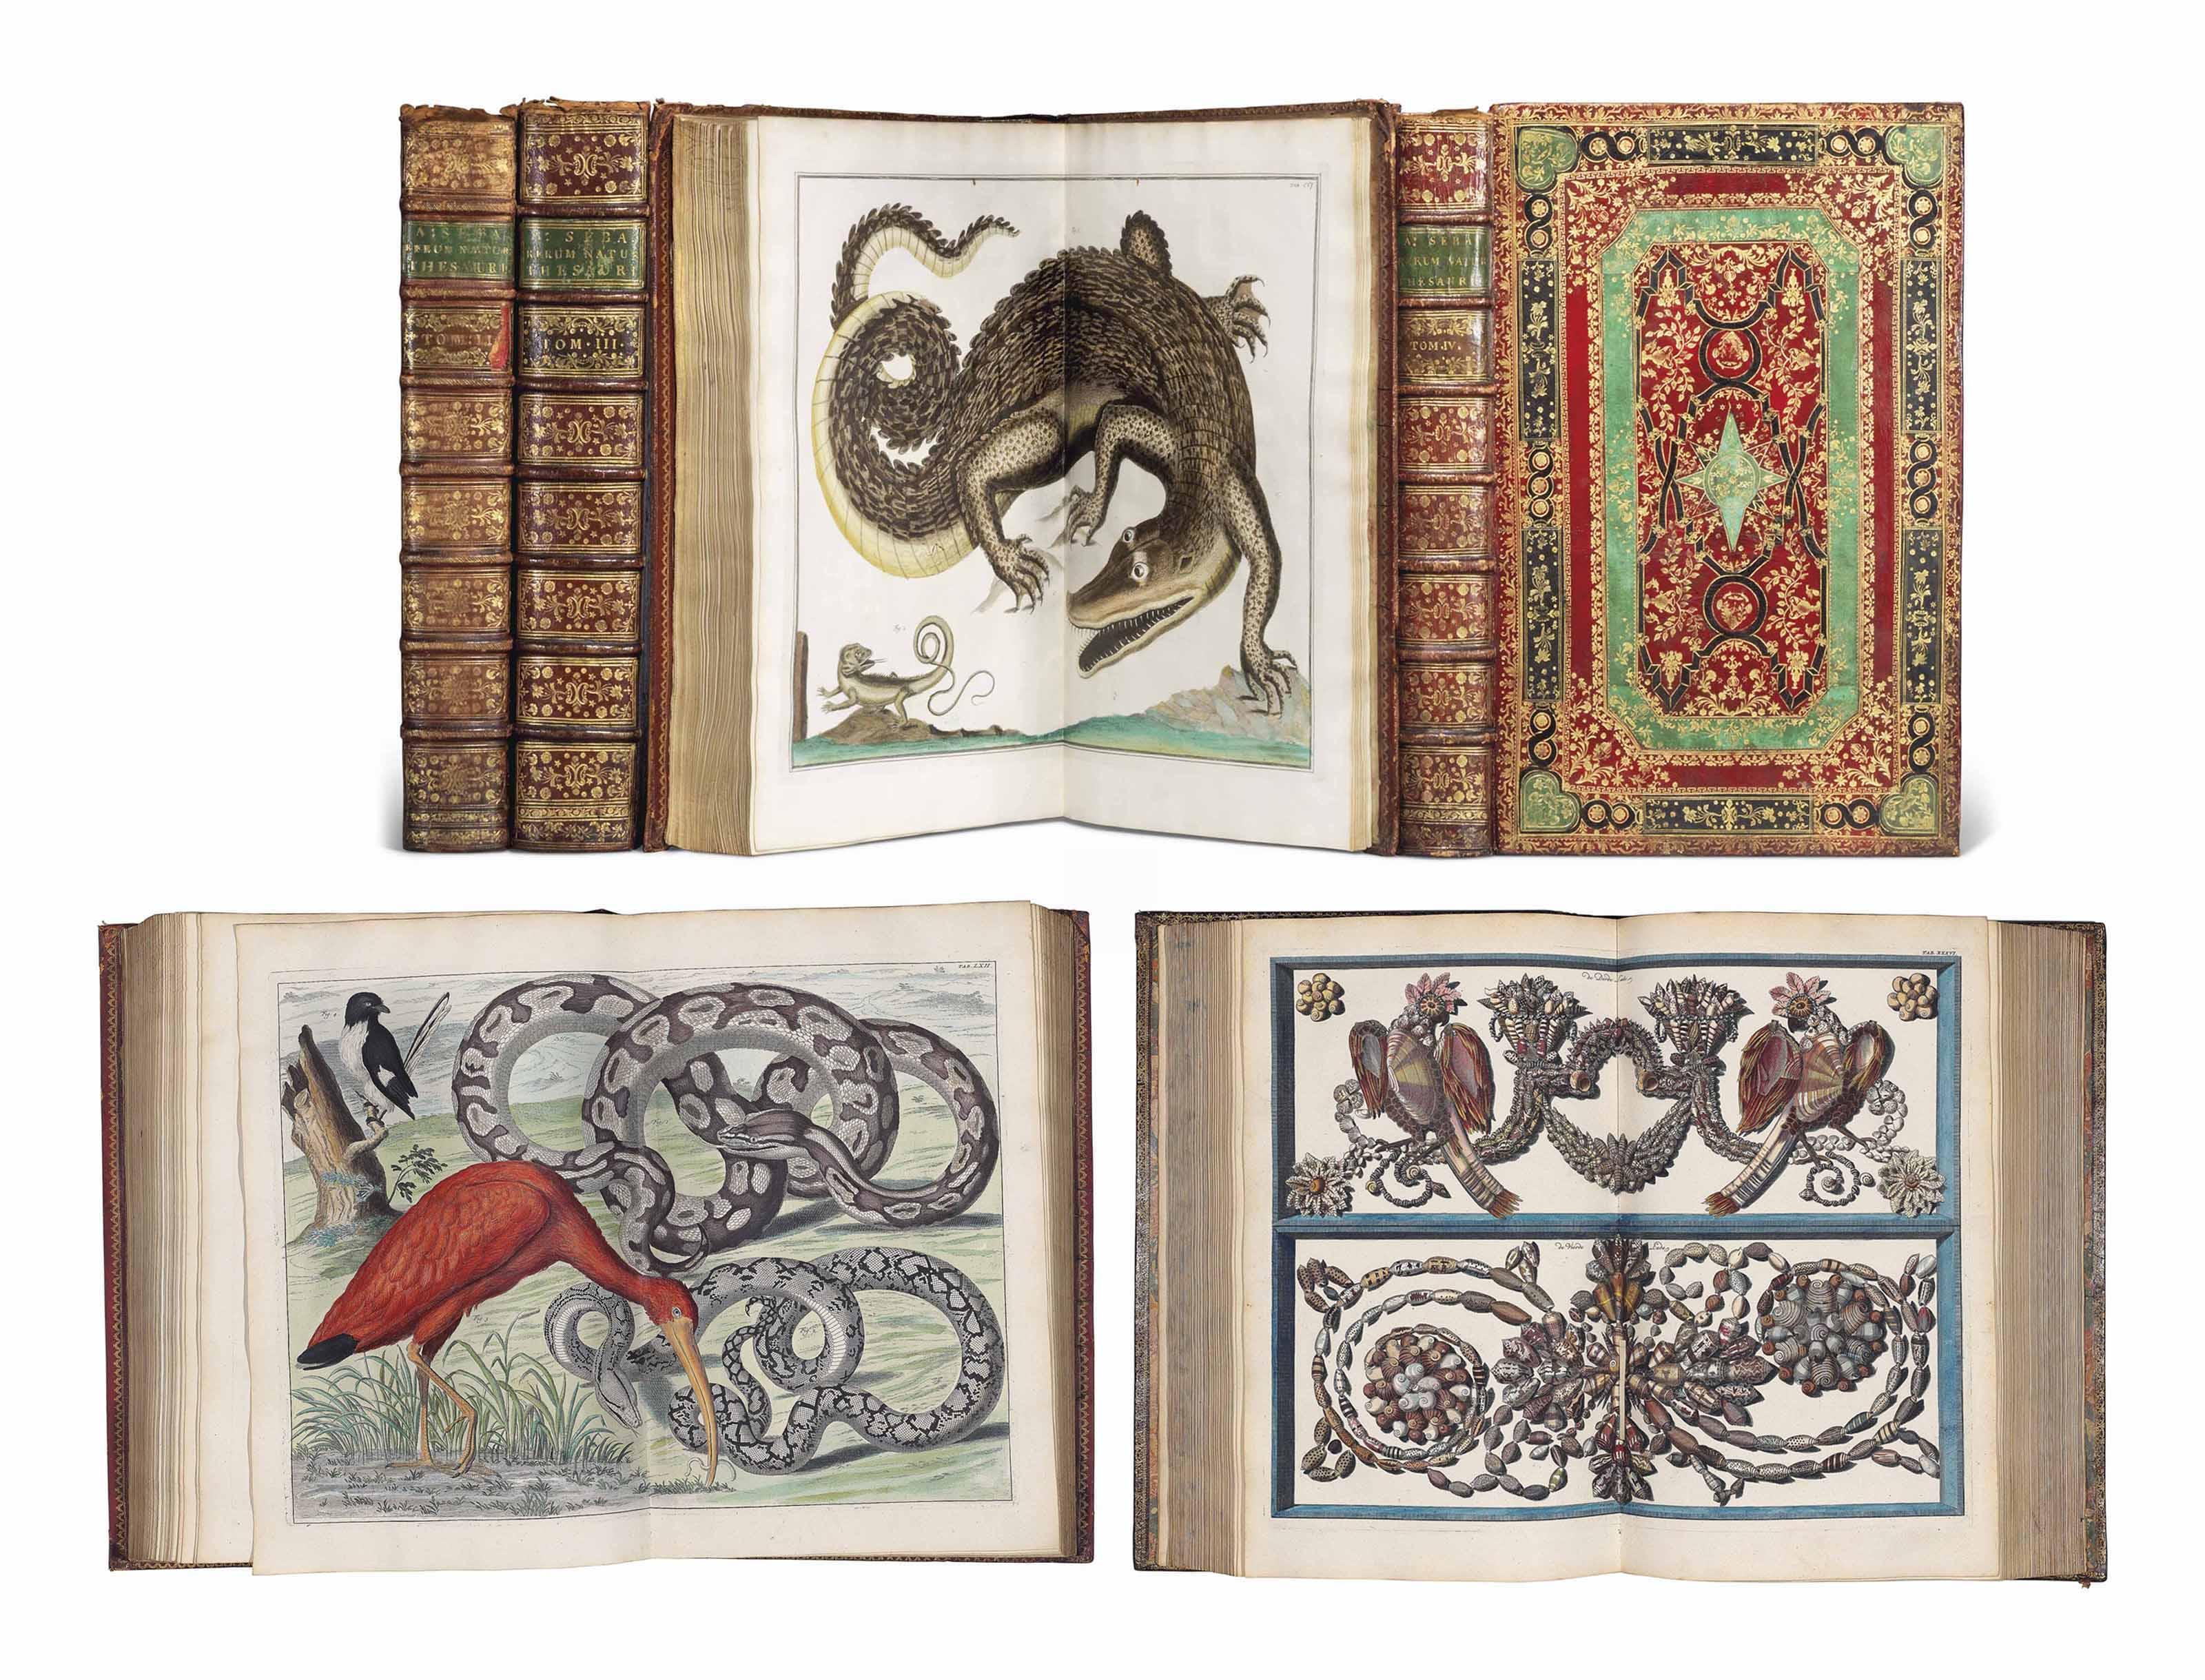 SEBA, Albertus. Locupletissimi rerum naturalium thesauri. Amsterdam: J. Wetsten, W. Smith, J. Waesberg, H.C. Arksteum, H. Merkum et P. Schouten, 1734-1735-1758 [-1760] -1765 [-1769].